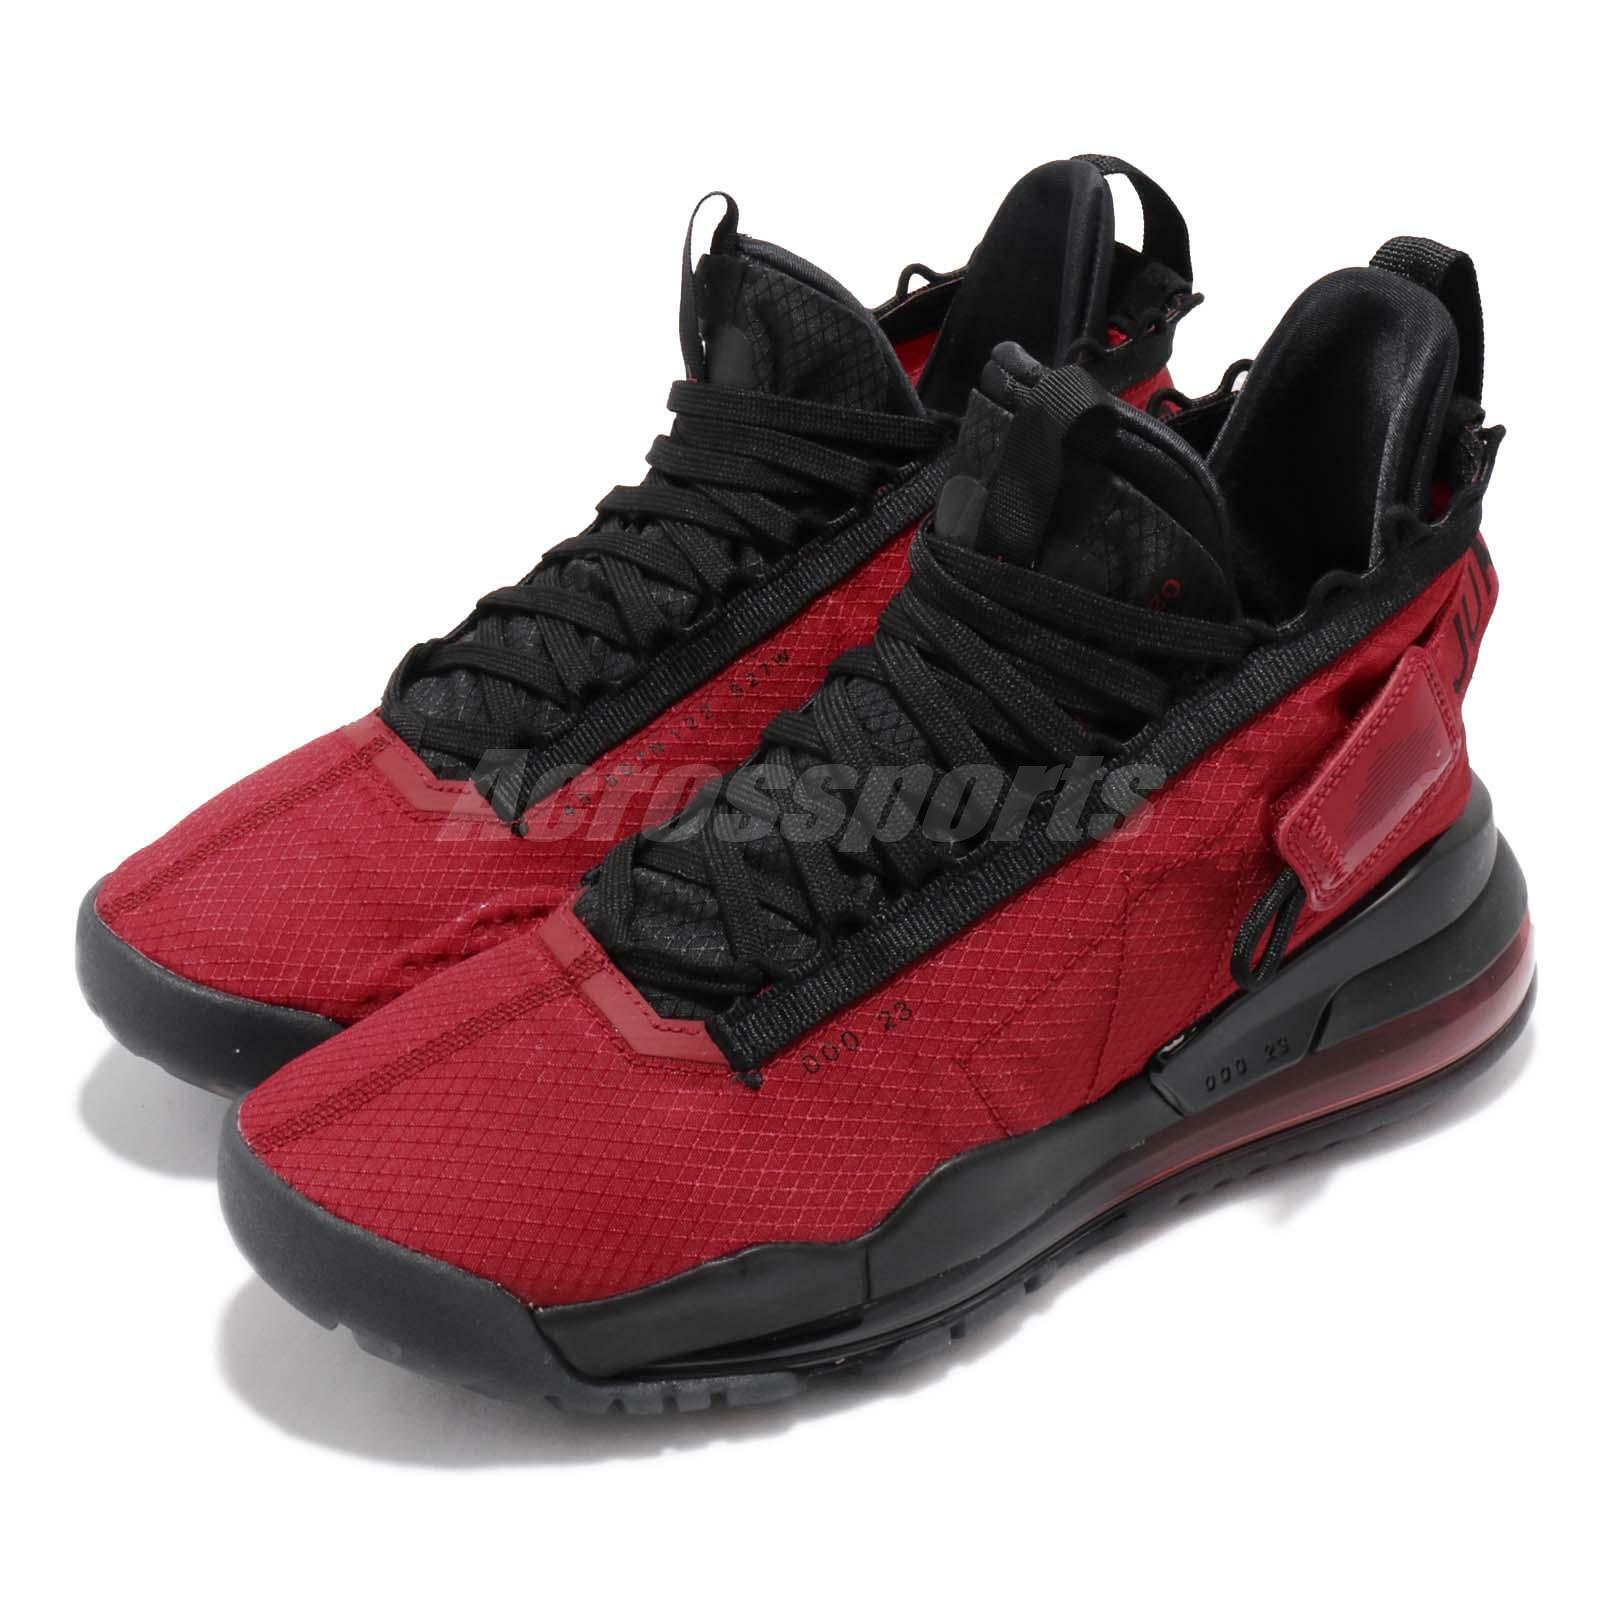 Nike Jordan Prossoo-Max 720 rosso nero Men Running Casual scarpe scarpe da ginnastica BQ6623-600